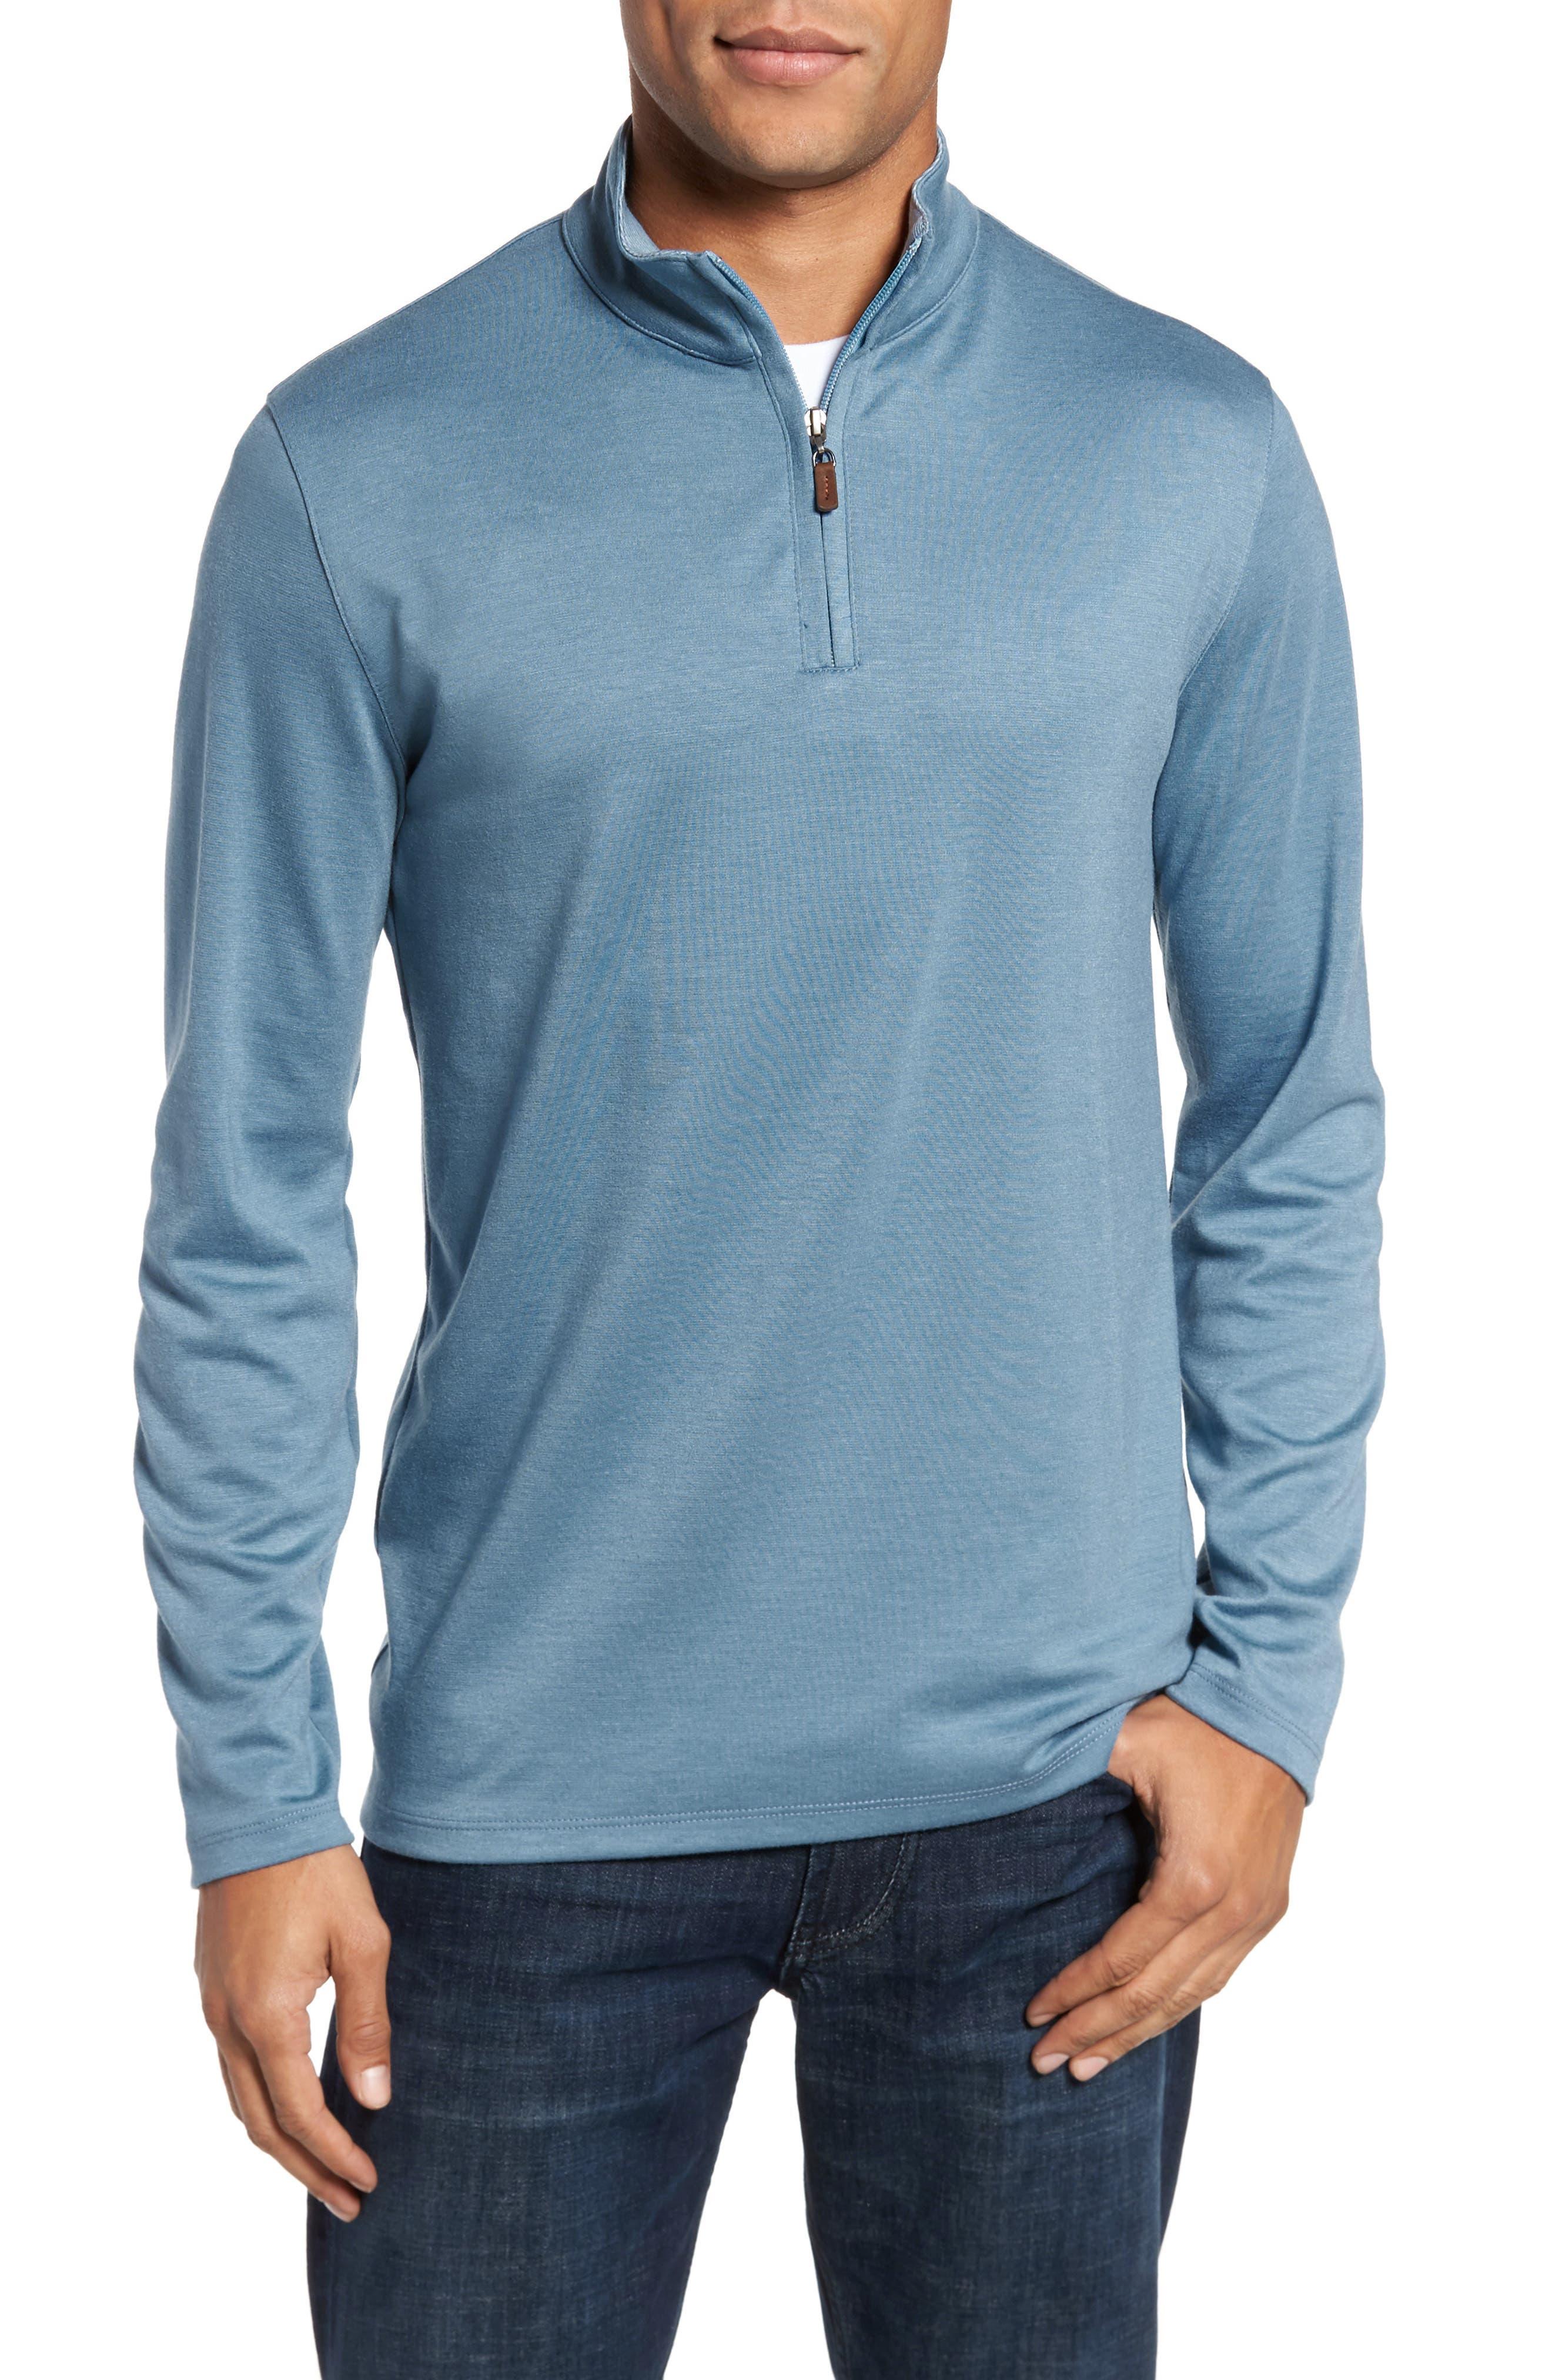 Quarter Zip Pullover,                             Main thumbnail 1, color,                             BLUE